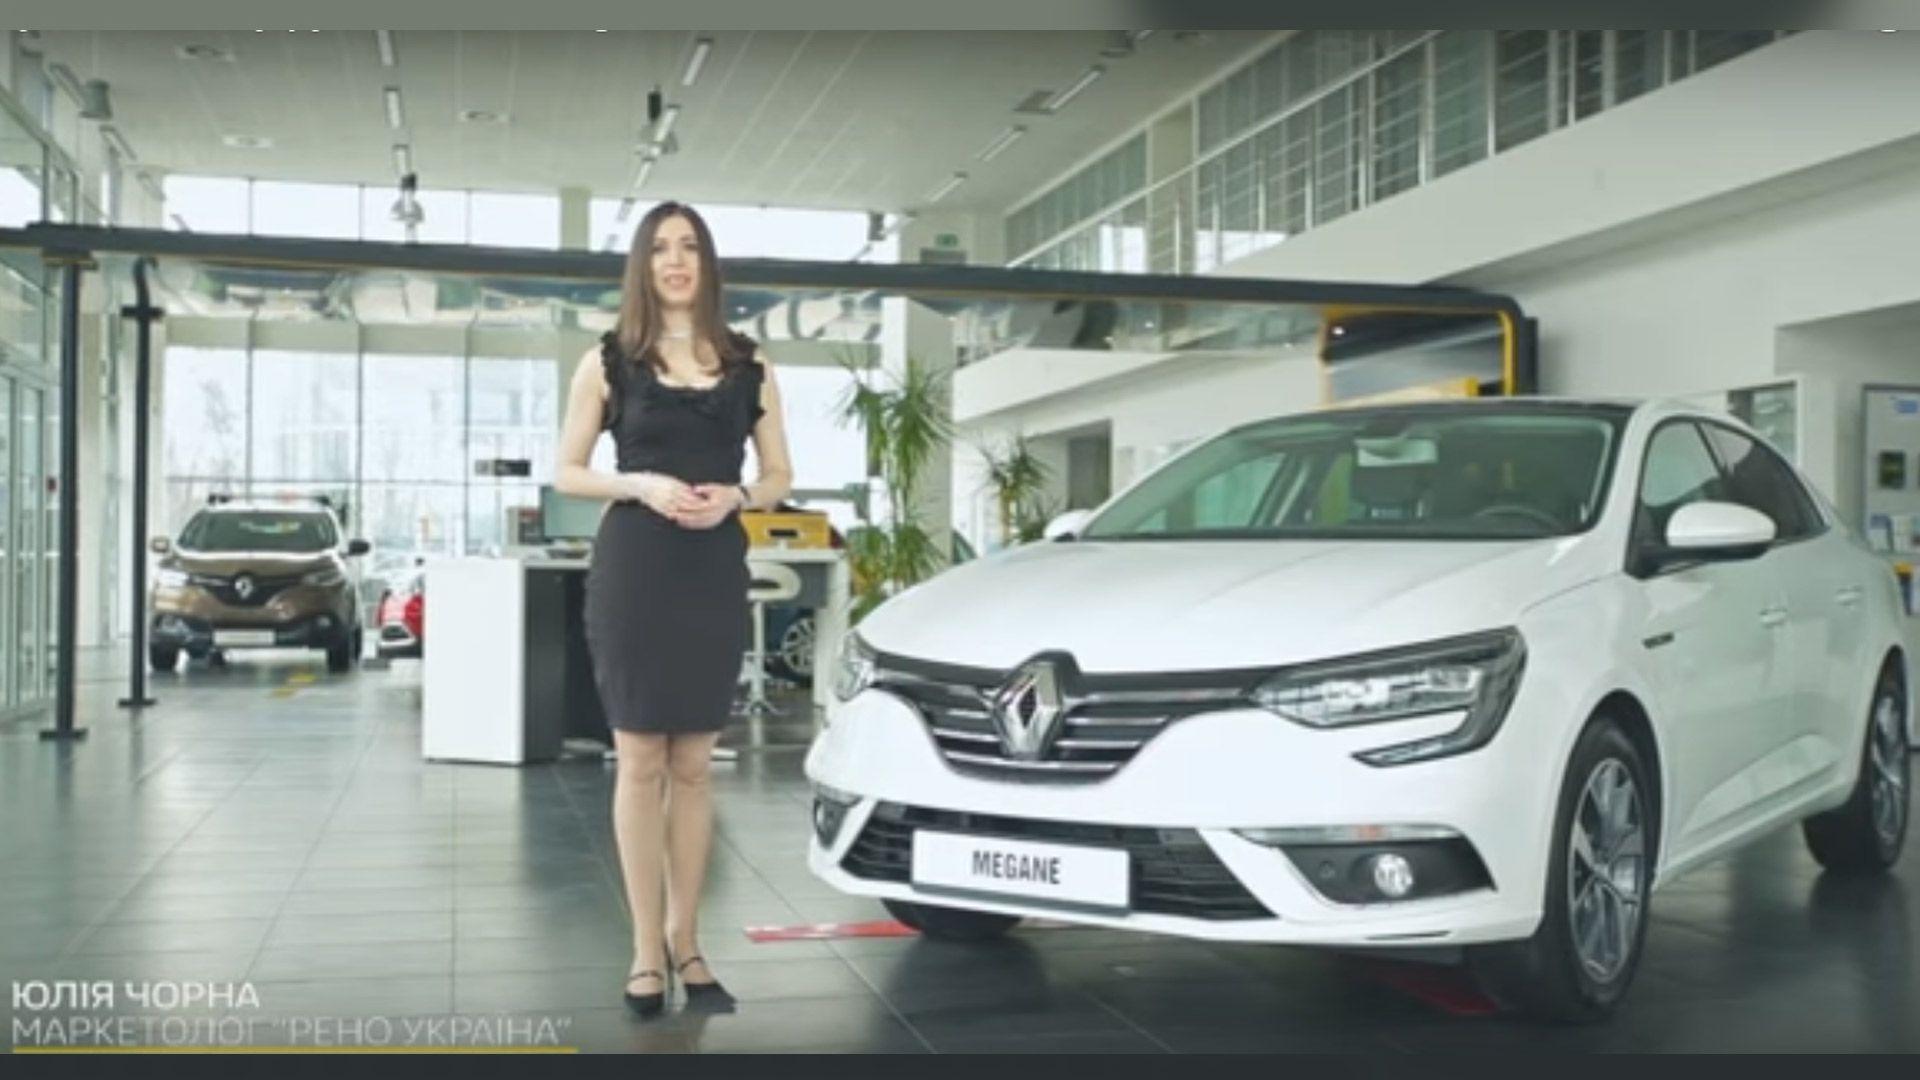 Віртуальний шоу-рум Renault Megane Седан